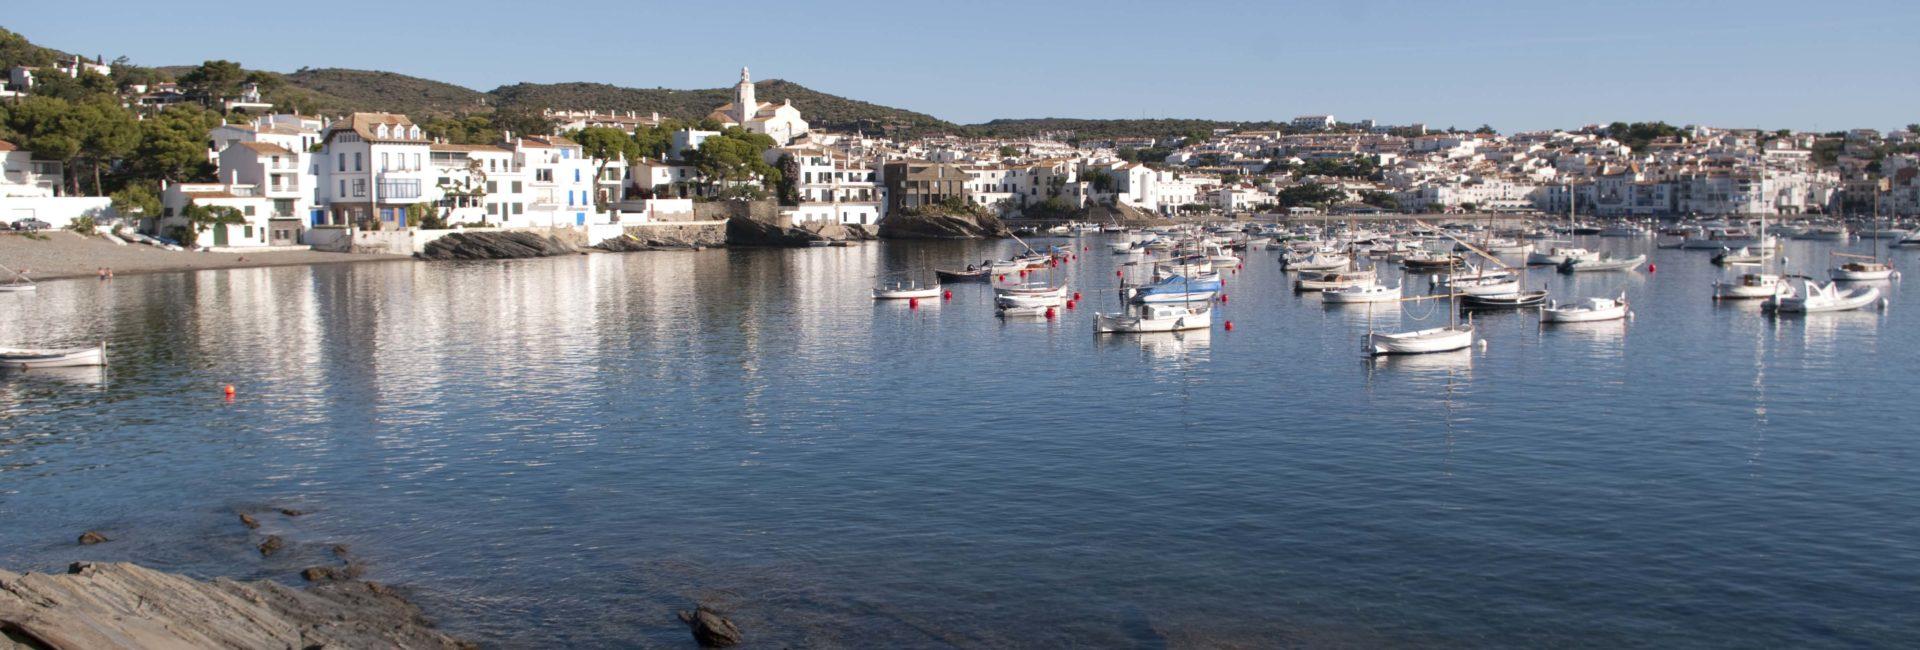 Le petit port de Cadaquès en Espagne